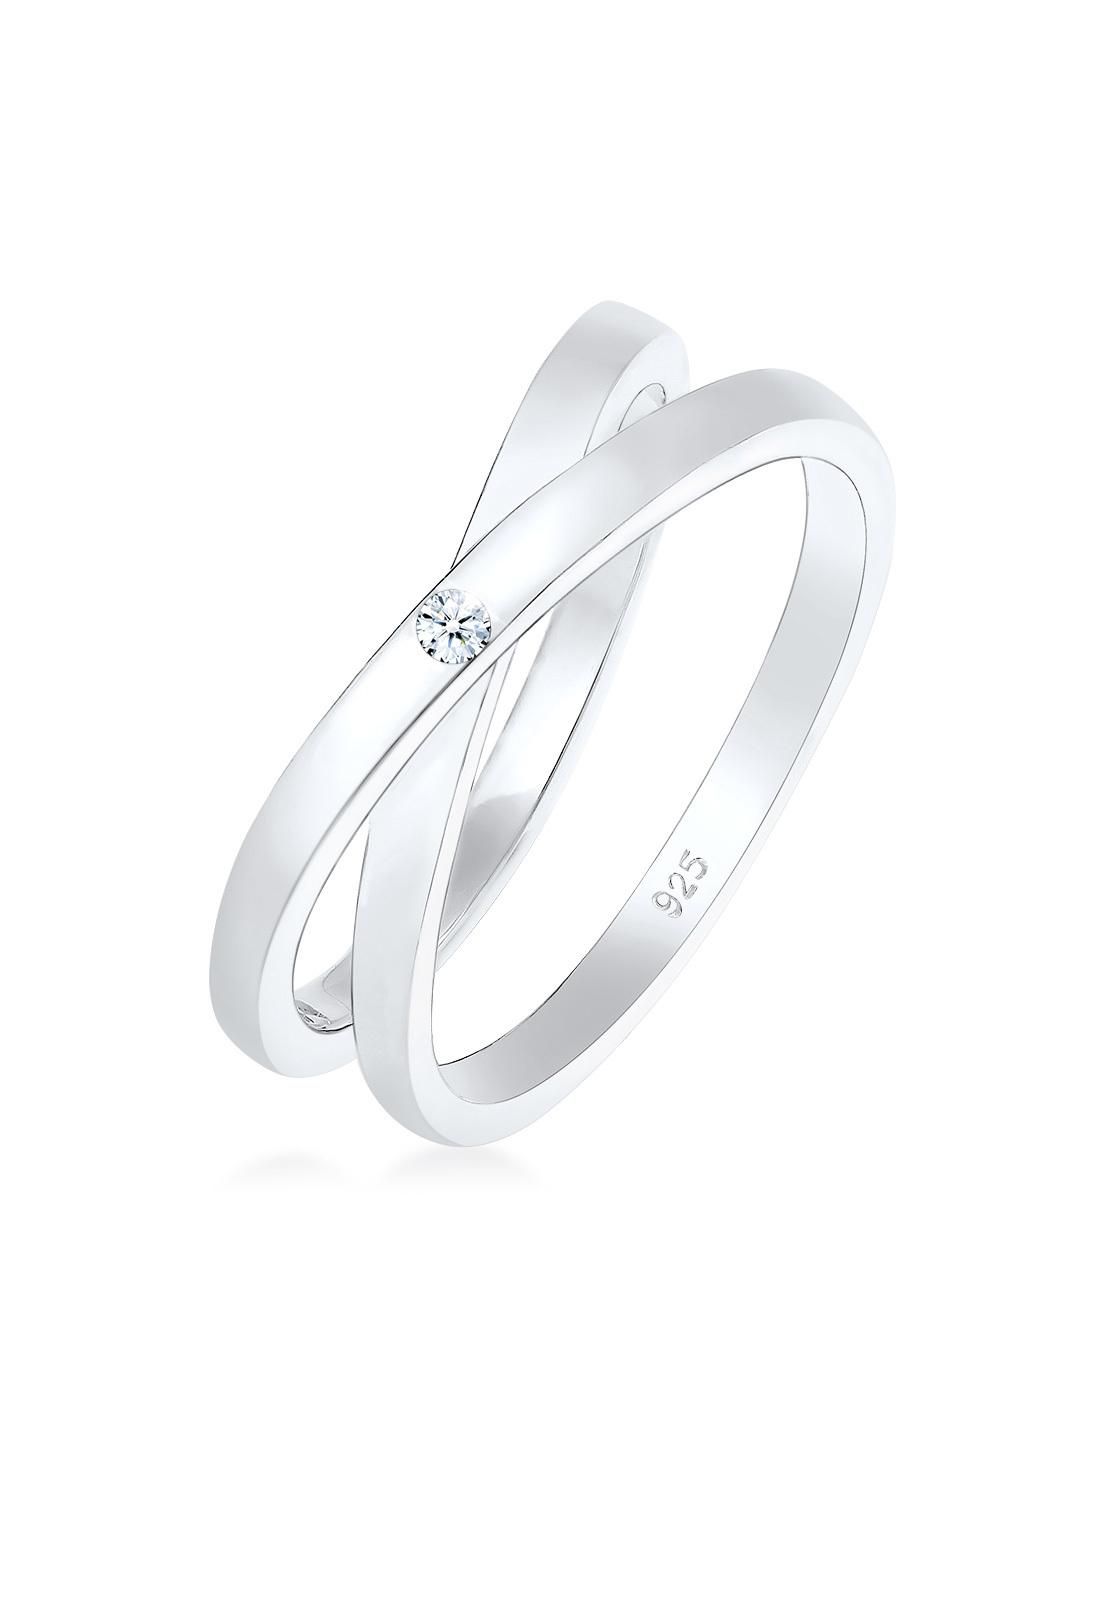 Wickelring | Diamant ( Weiß, 0,015 ct ) | 925er Sterling Silber